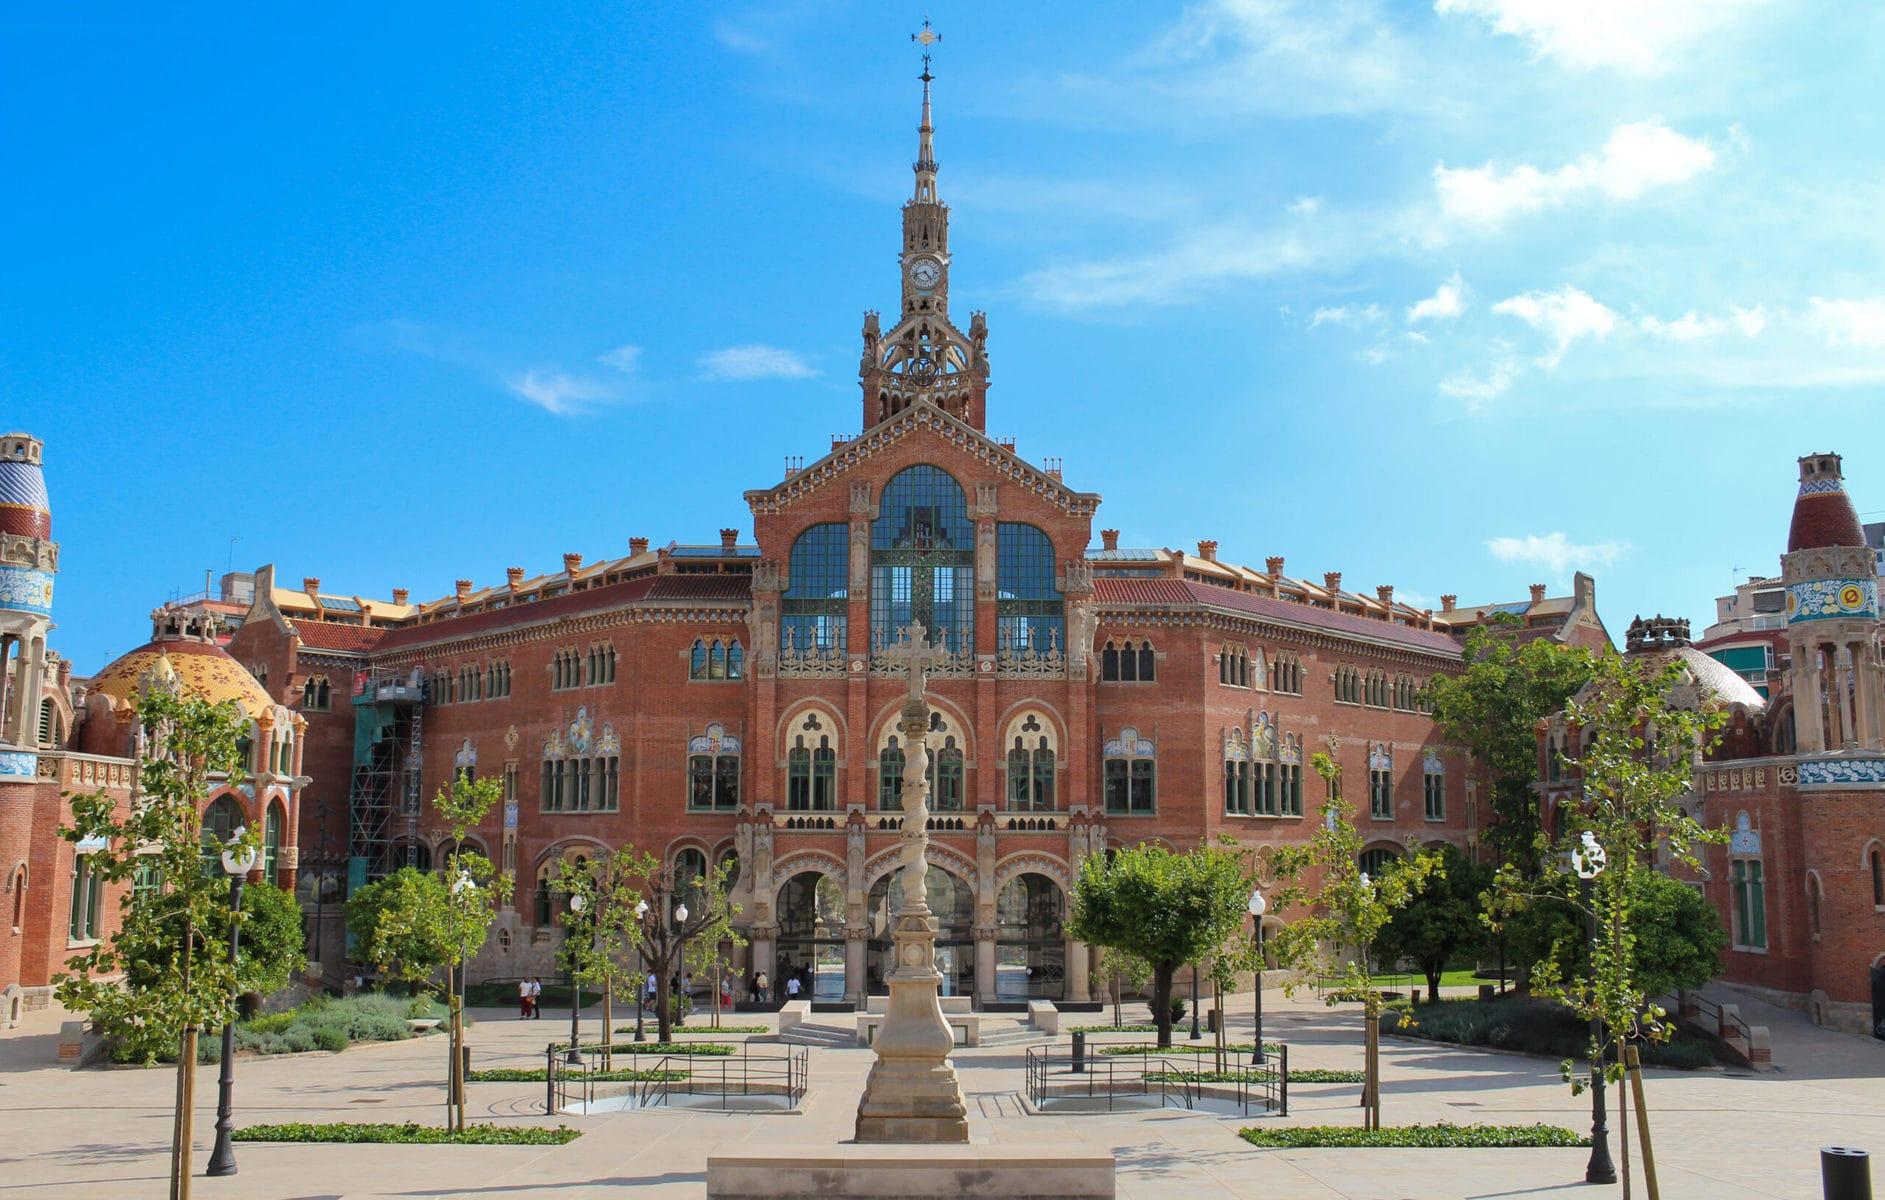 Hospital de Sant Pau, Barcelona, Rückseite des Haupteingangs und Hauptgebäudes